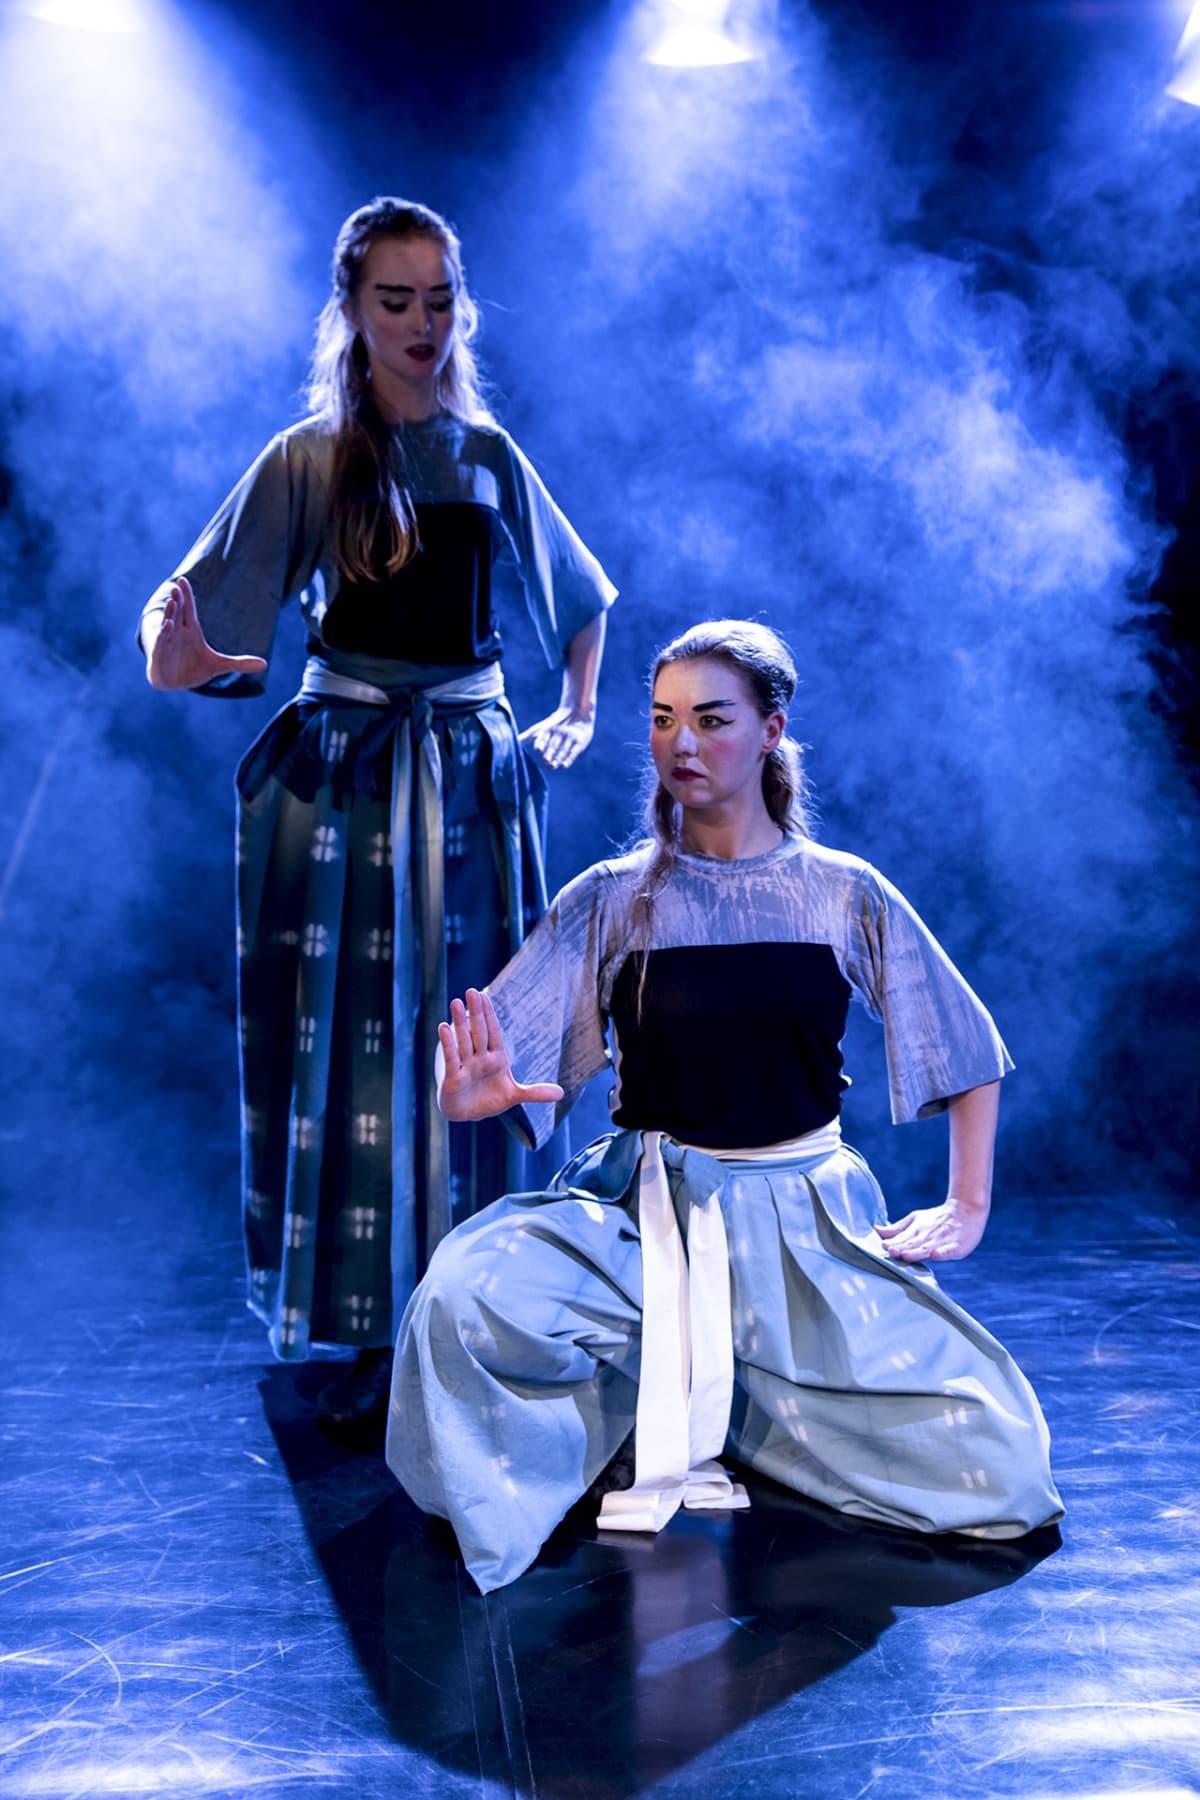 Nora Sandholm-Azémar, Freia Stenbäck, Wusheng Company, kiinalainen teatteri